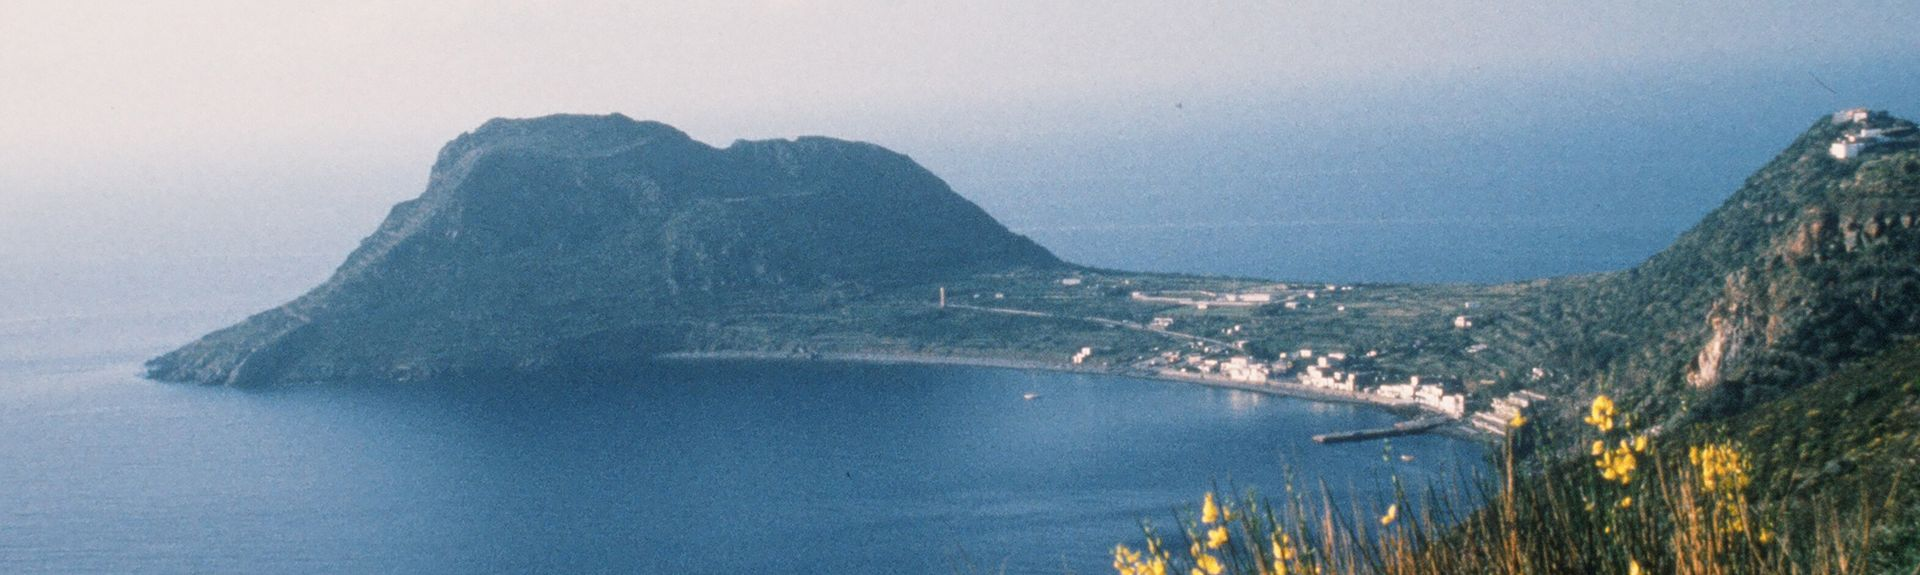 Filicudi, Italy